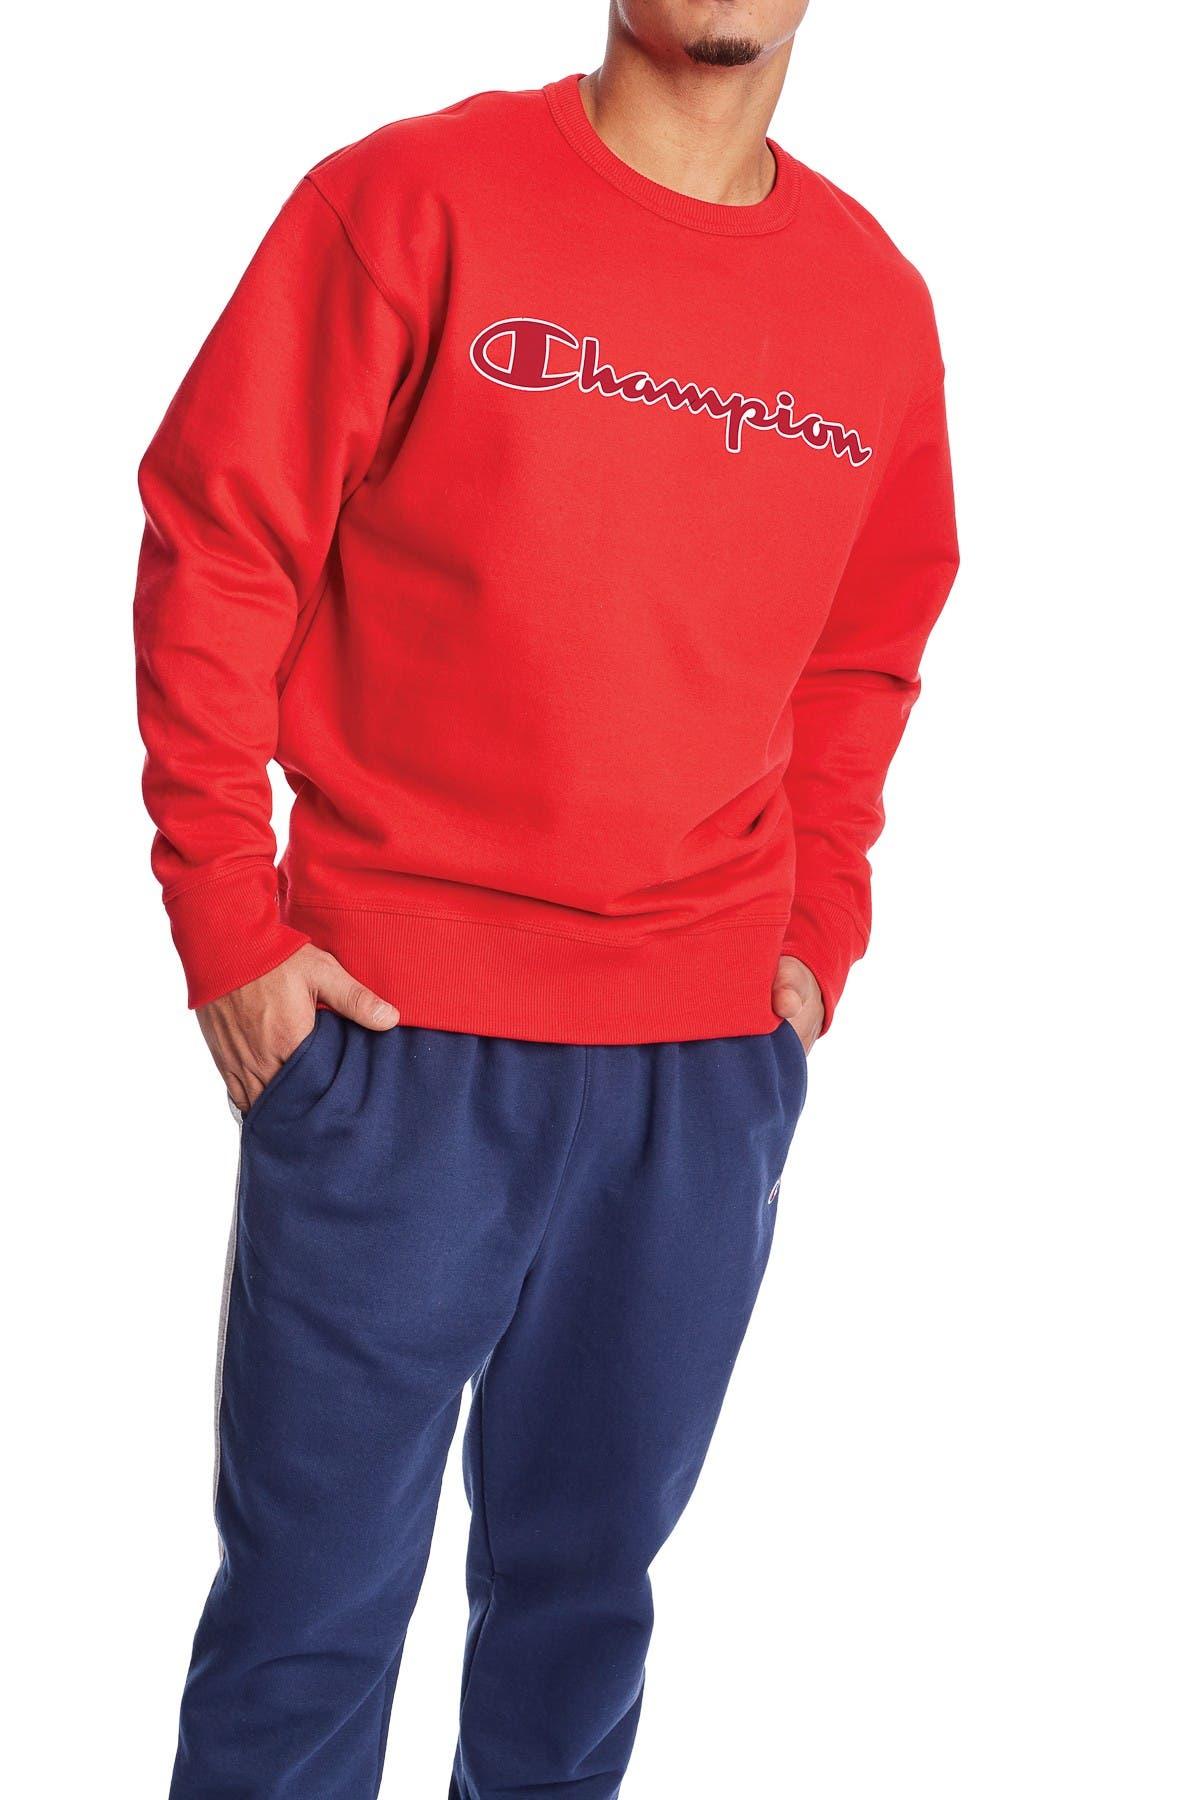 Image of Champion Powerblend Applique Sweatshirt